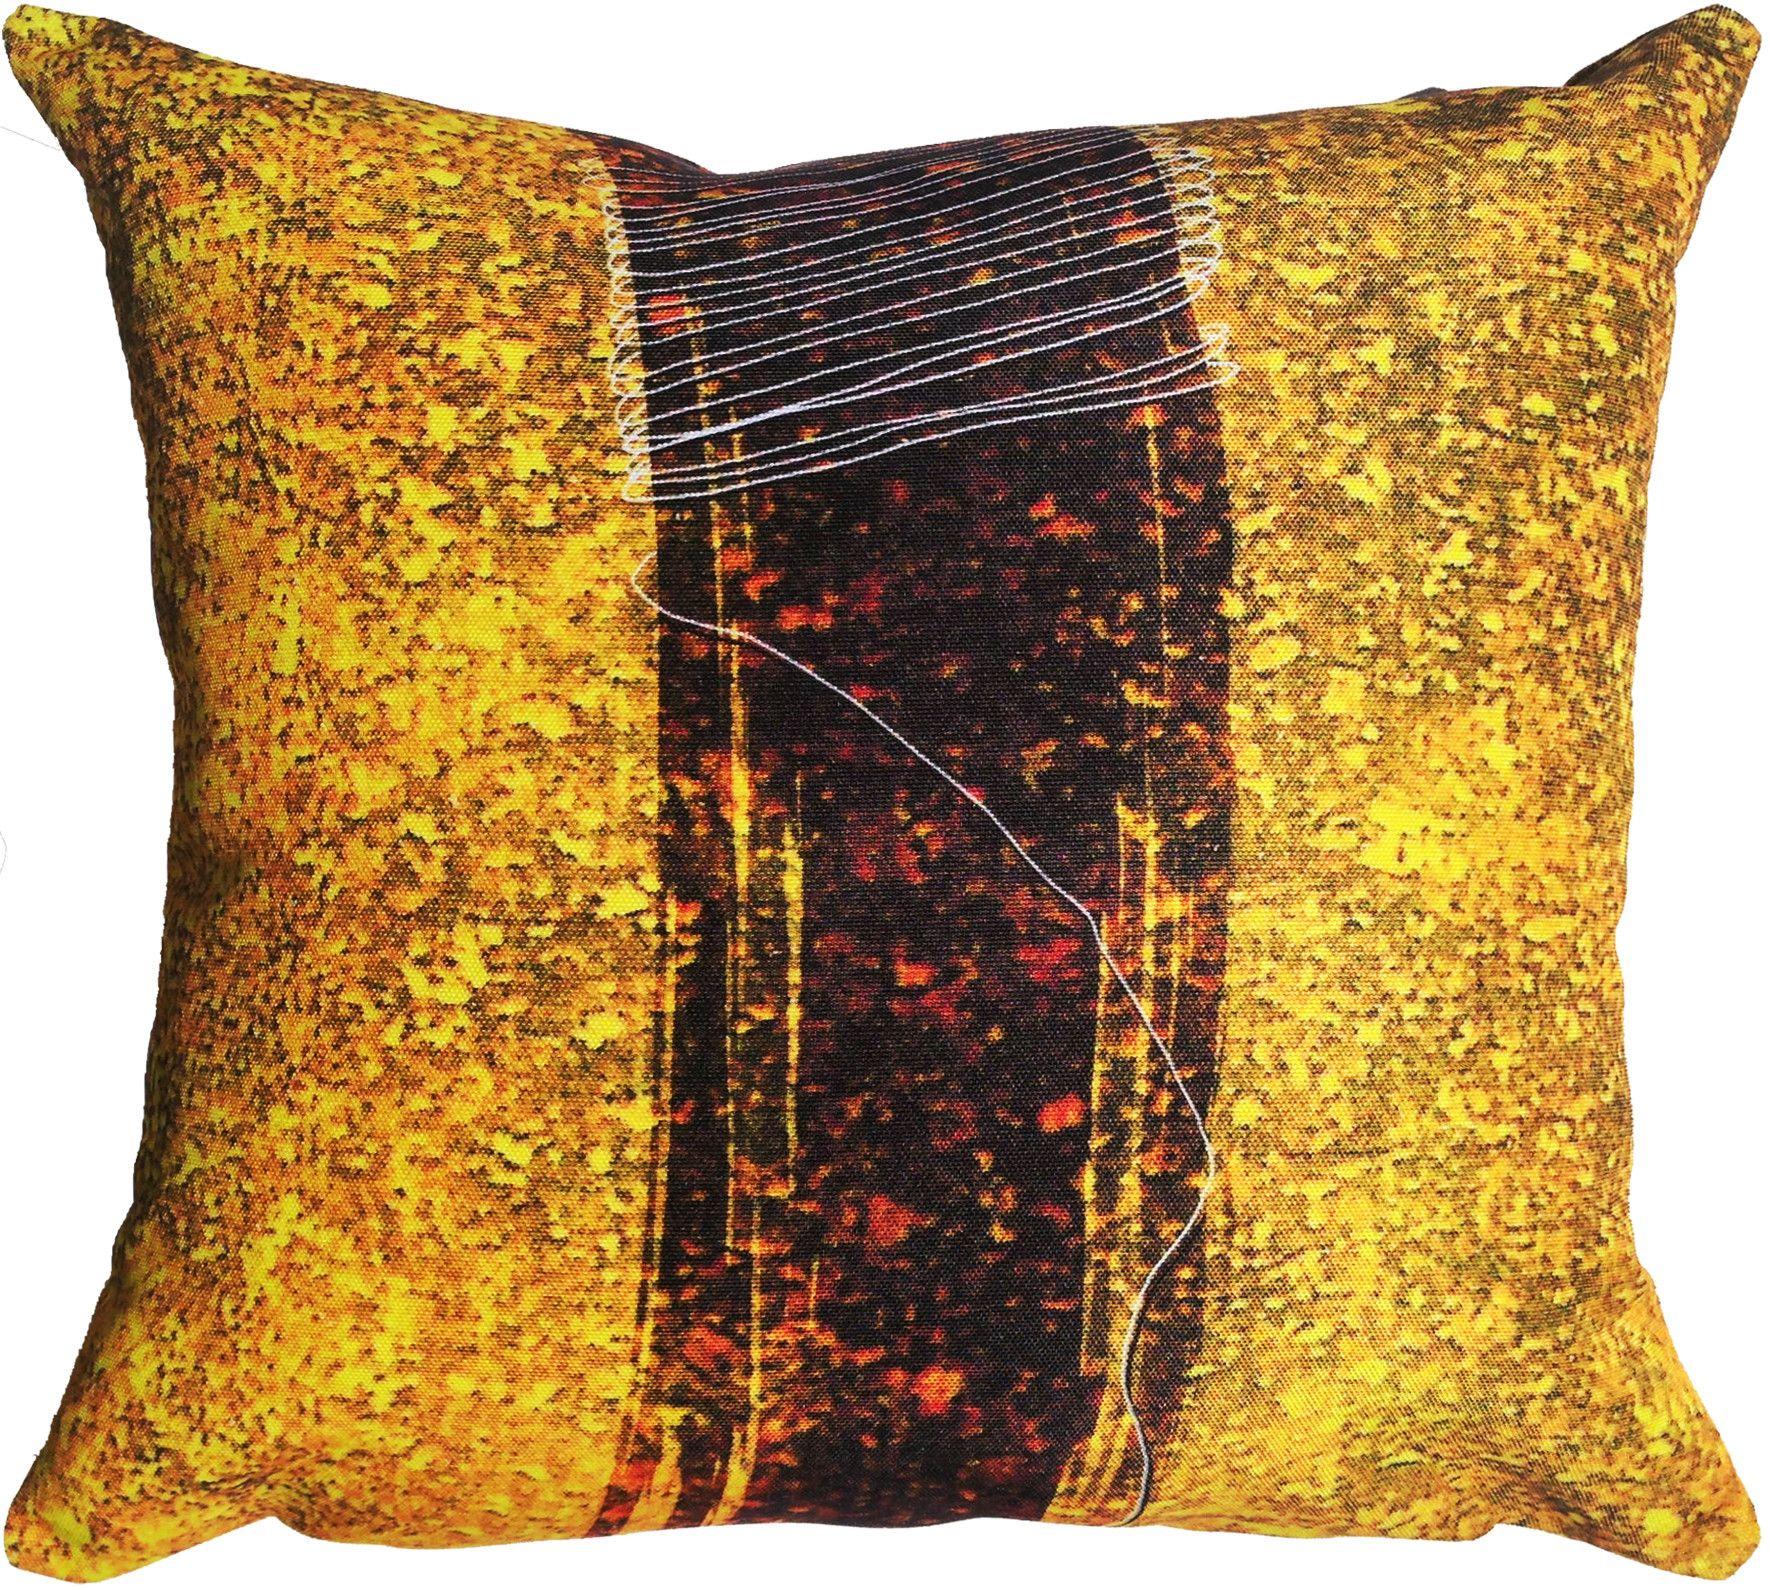 'Ambitious Thread' Throw Pillow